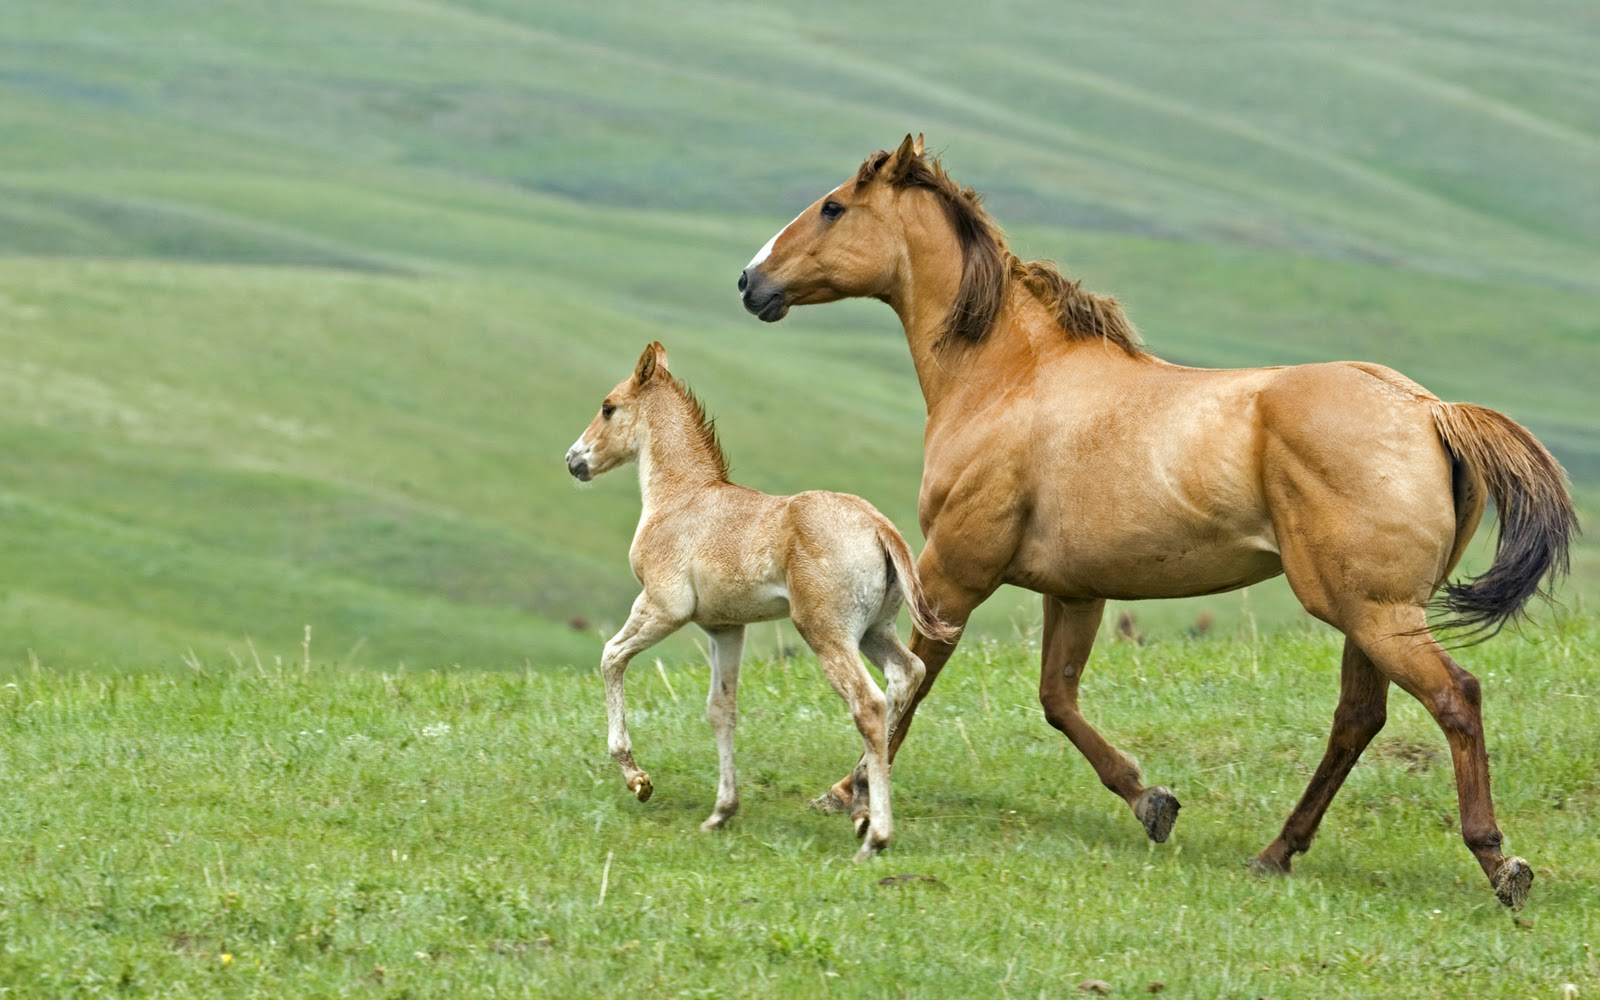 http://4.bp.blogspot.com/_W1ueYt1O3xs/TOey-TCMDkI/AAAAAAAAXUE/0FxgJb4lHK8/s1600/Horses+Wallpapers+1920x1200-1.jpg